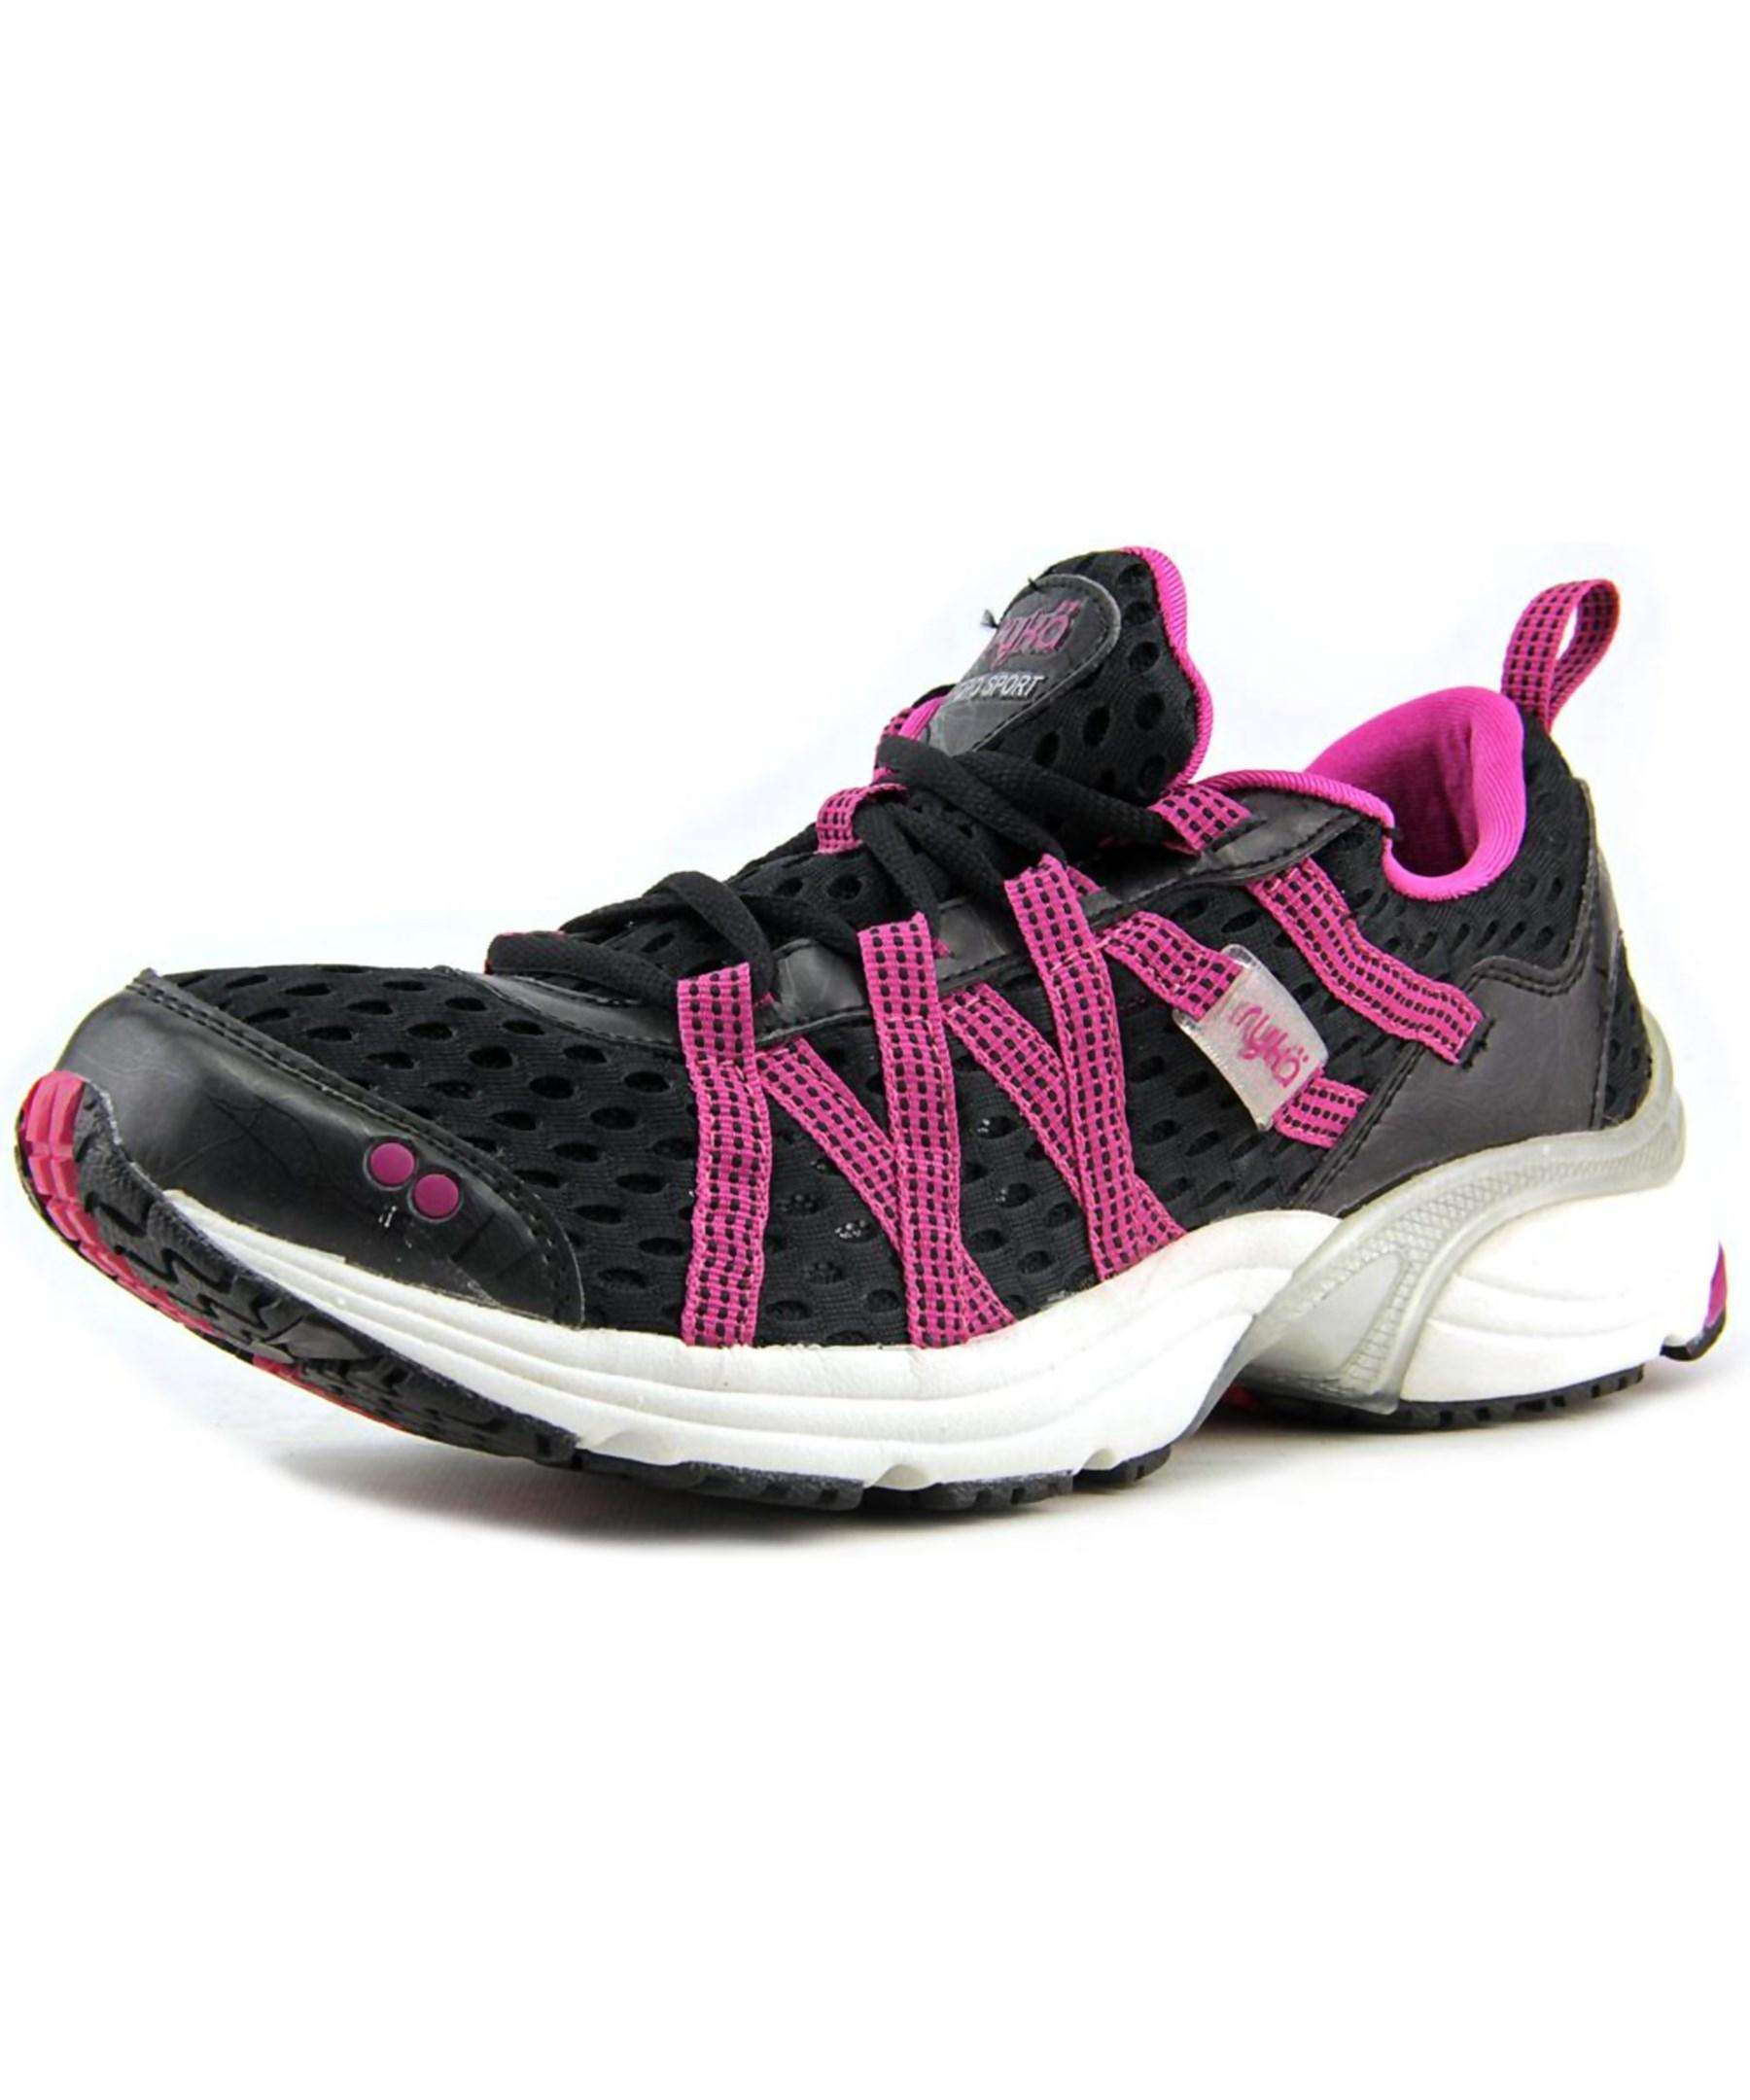 Ryka Mens Water Shoes